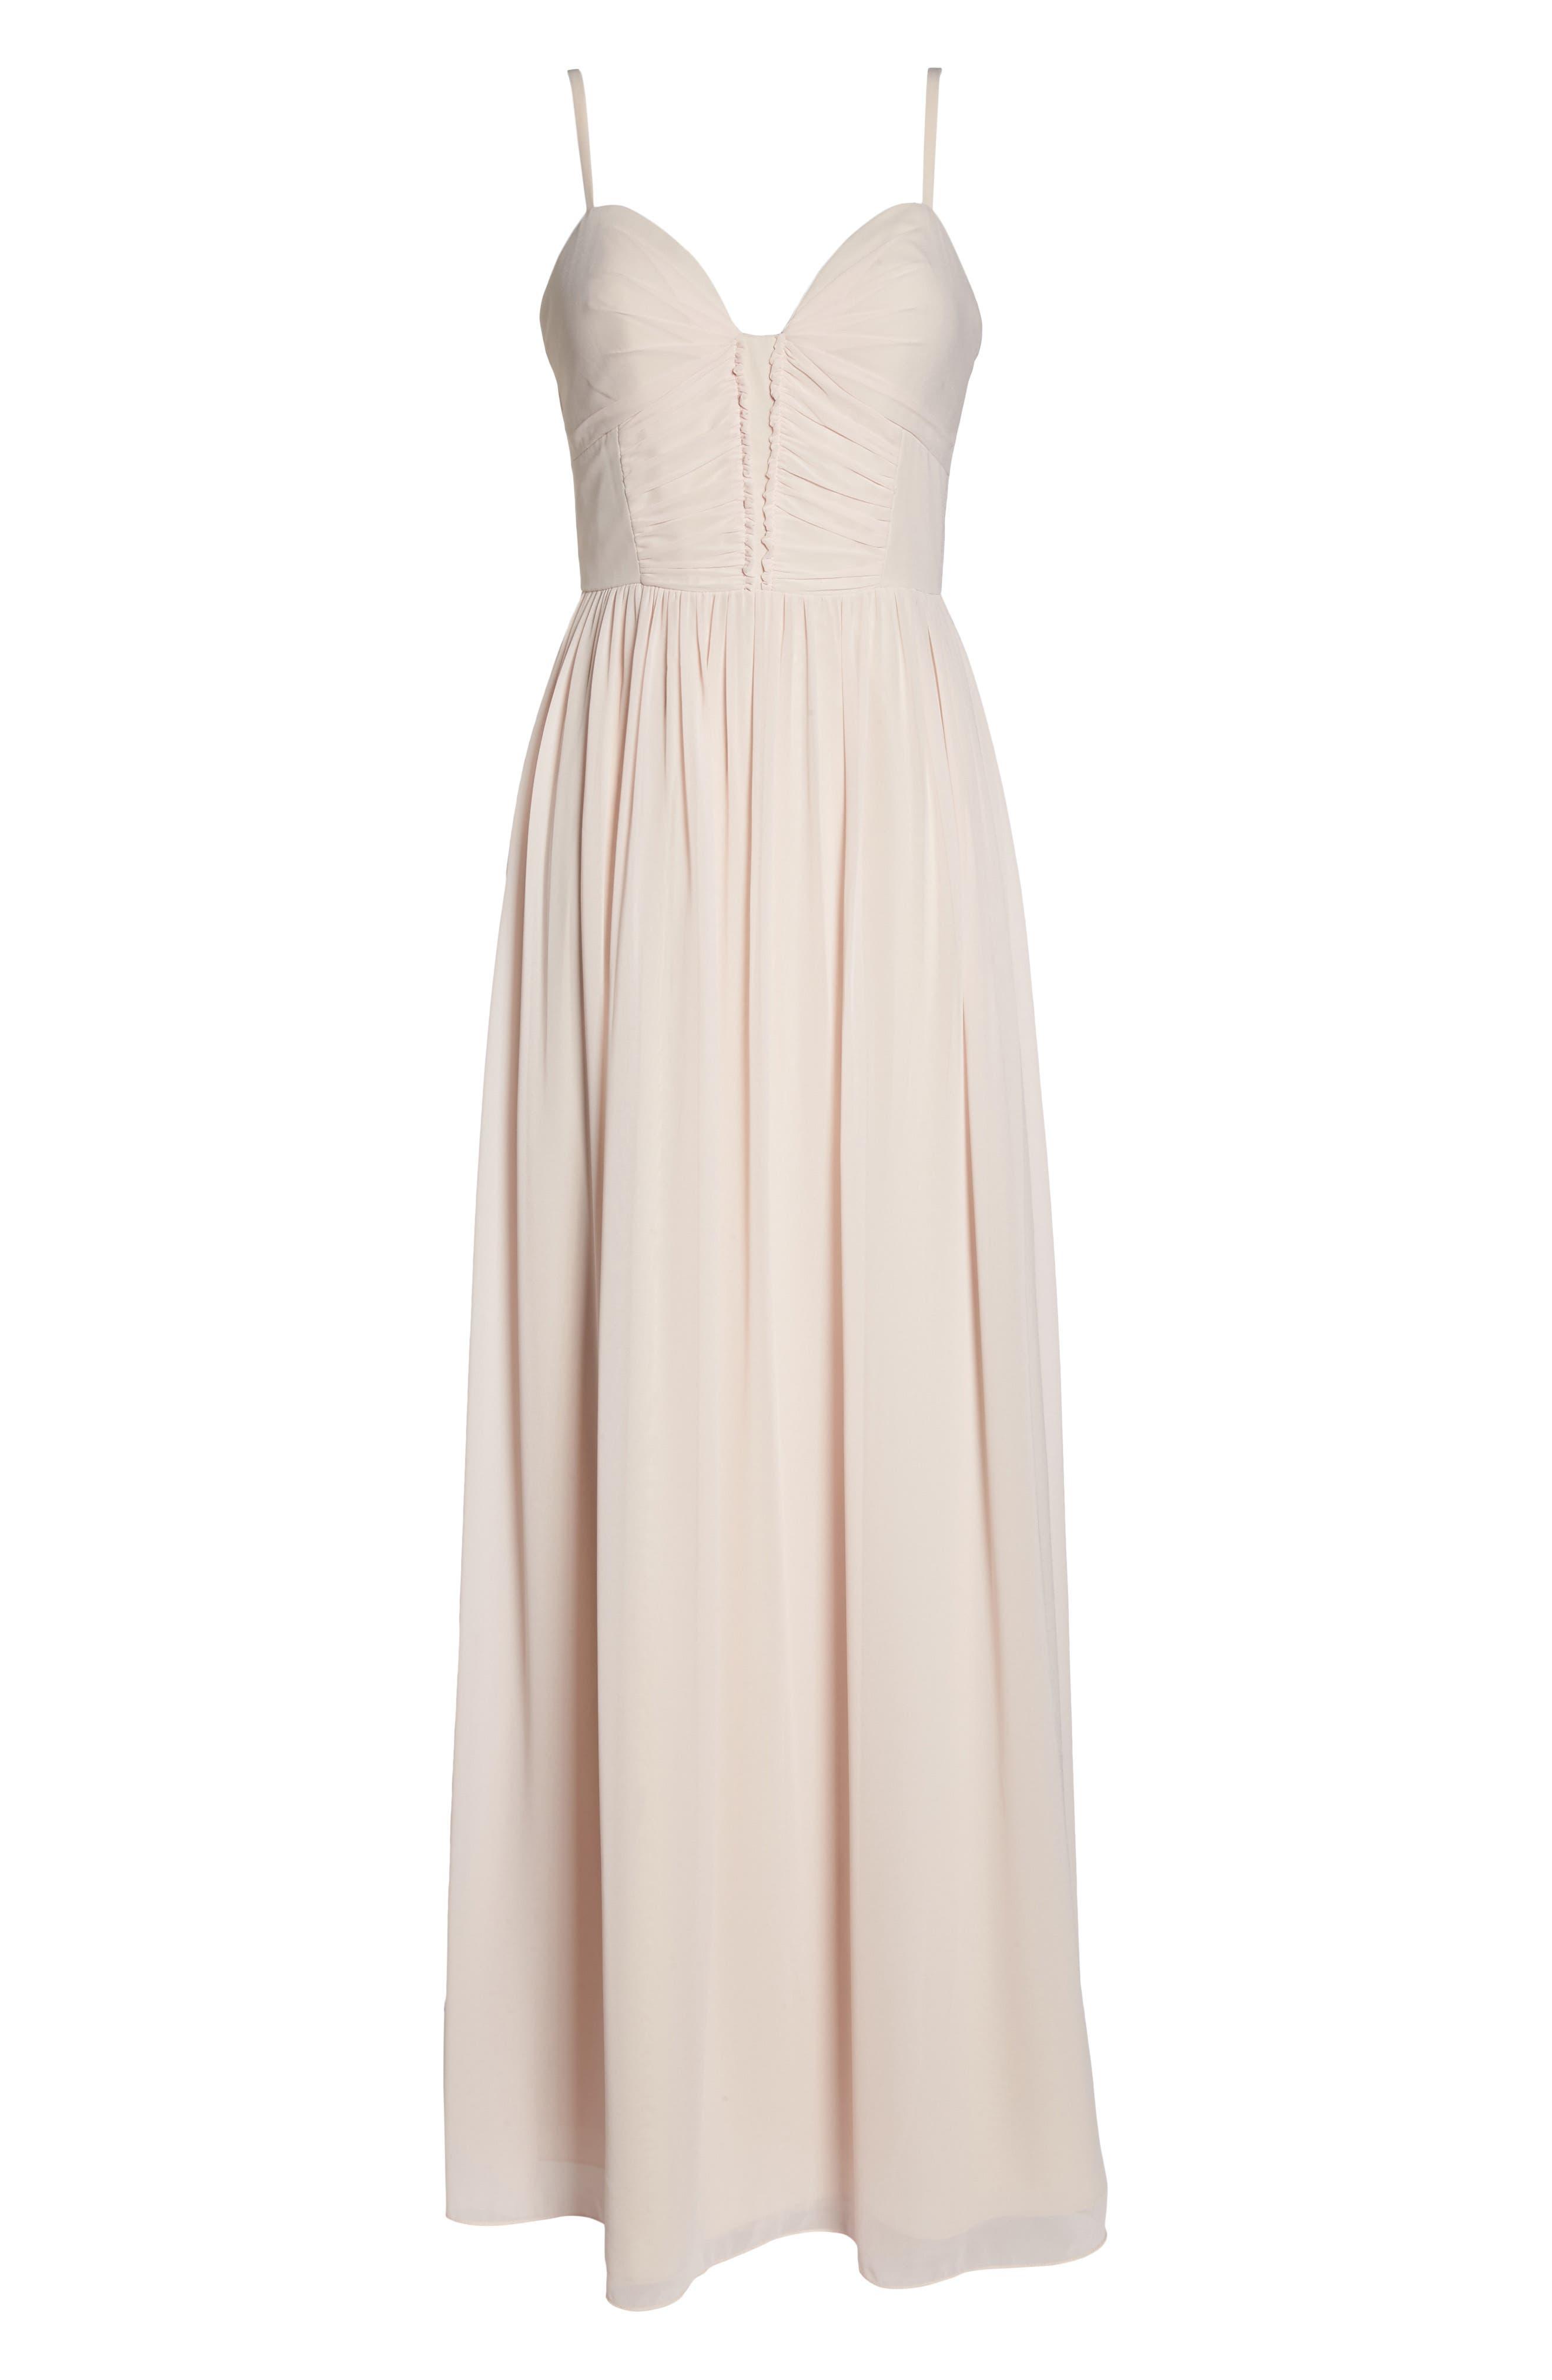 Ruffle Detail A-Line Chiffon Gown,                             Alternate thumbnail 6, color,                             Blush Cashmere